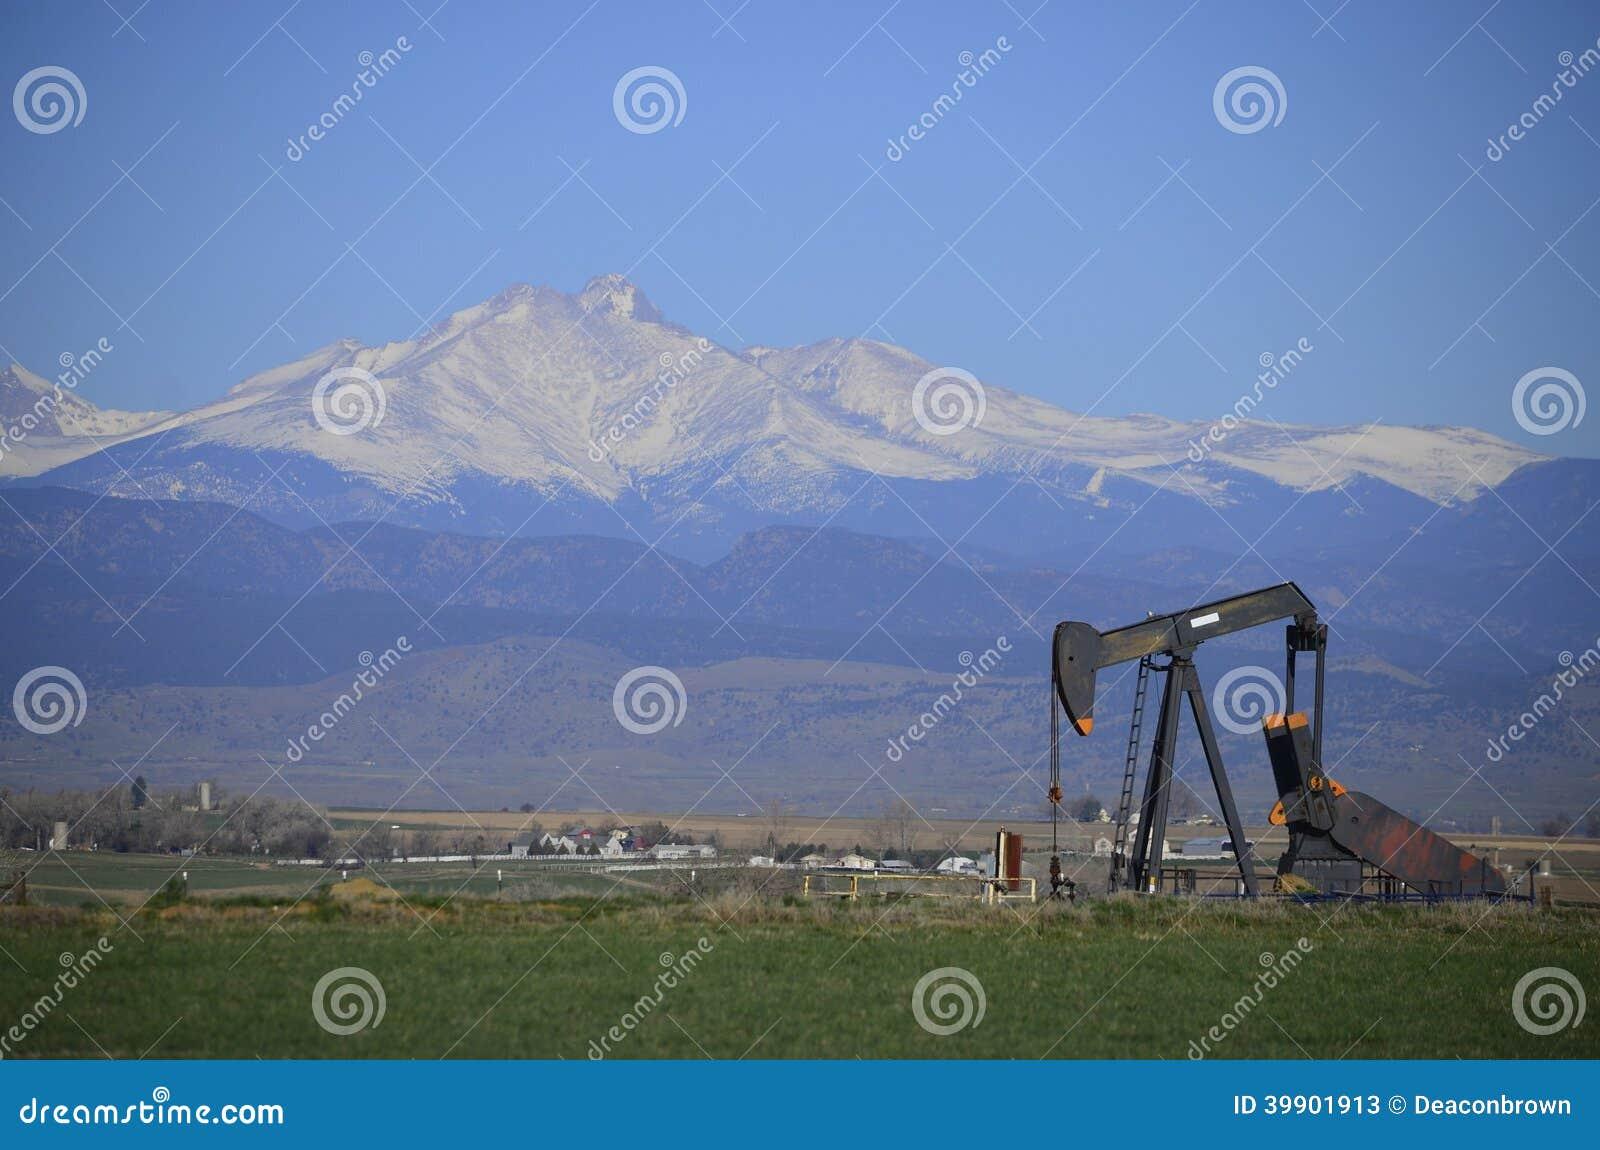 La bomba Jack Oil bien y desea pico